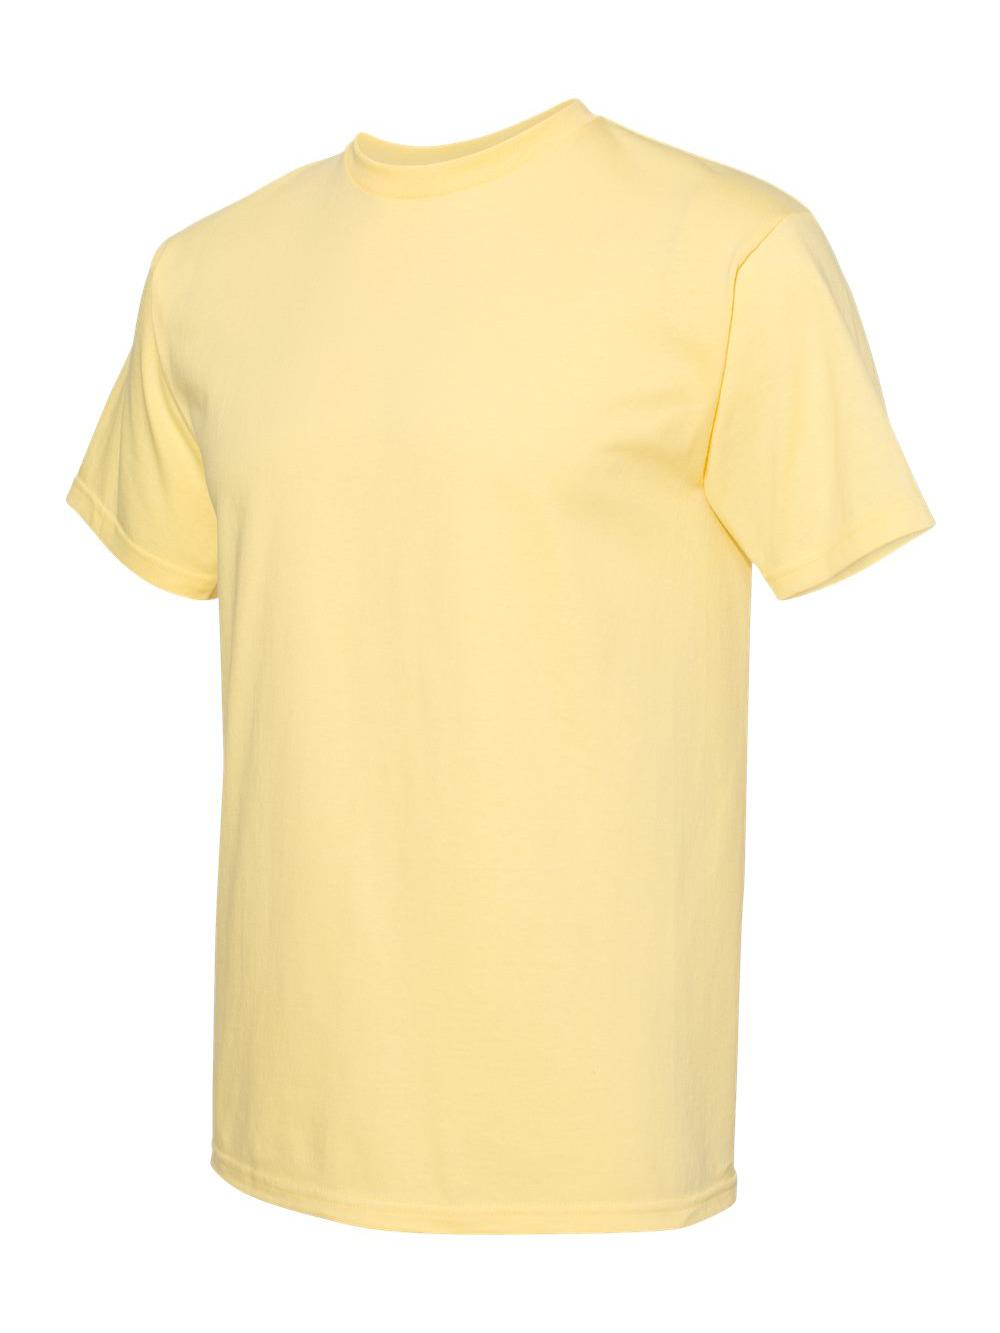 ALSTYLE-Premium-T-Shirt-1701 thumbnail 5